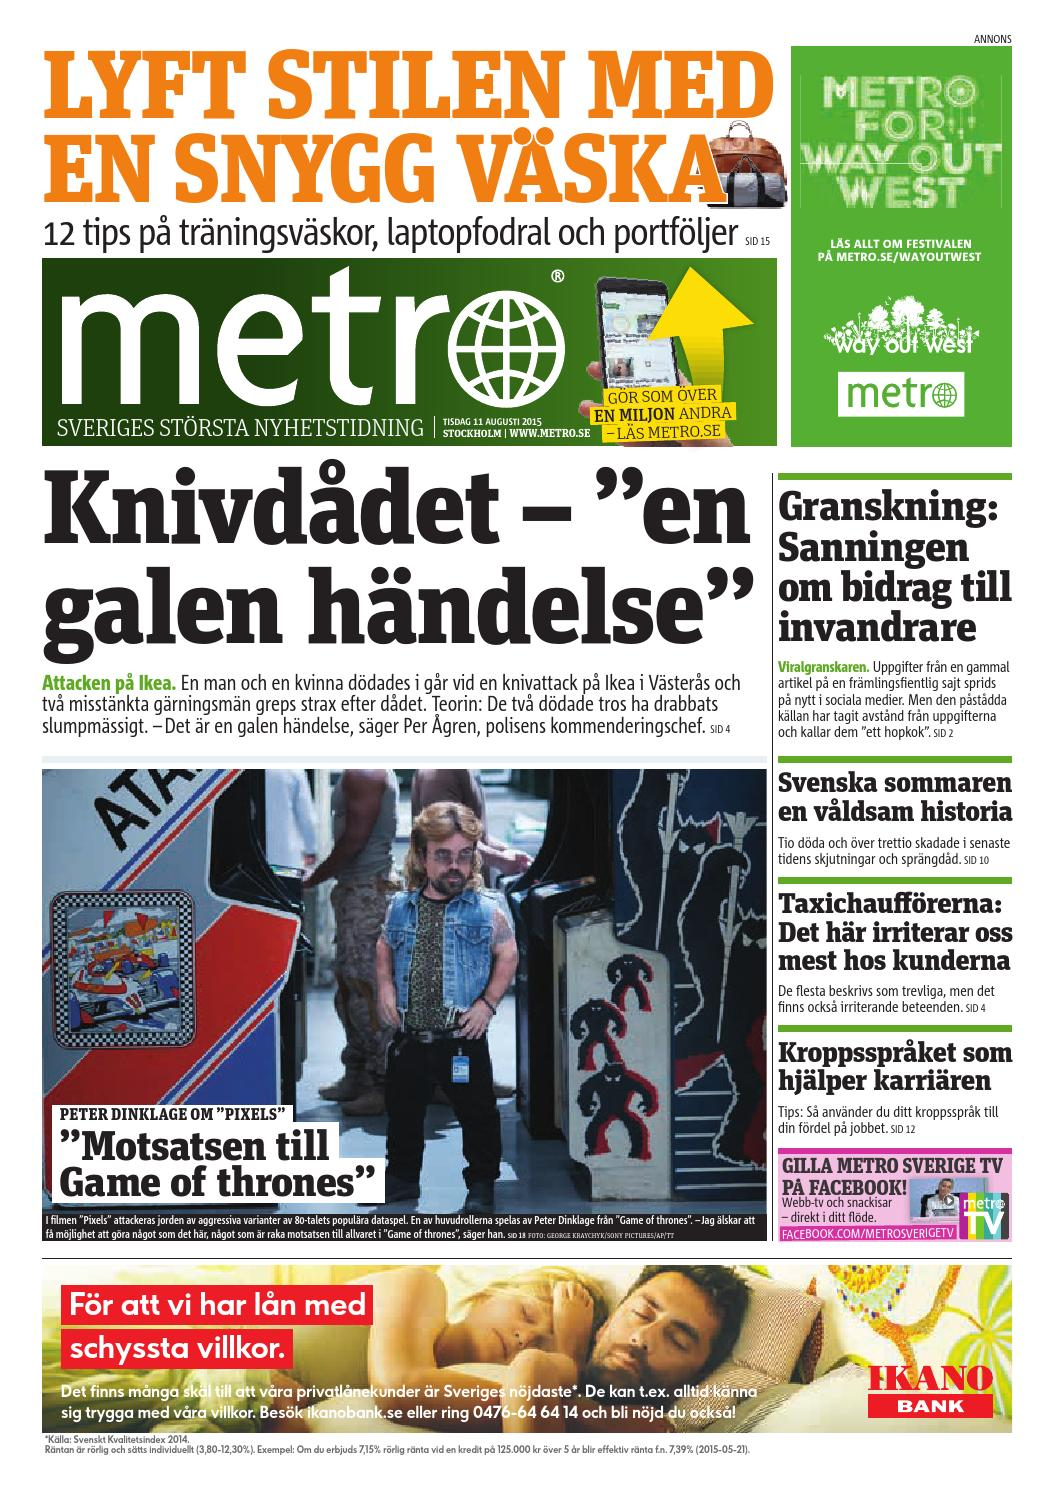 d9ff514eb56 20150811_se_stockholm by Metro Sweden - issuu